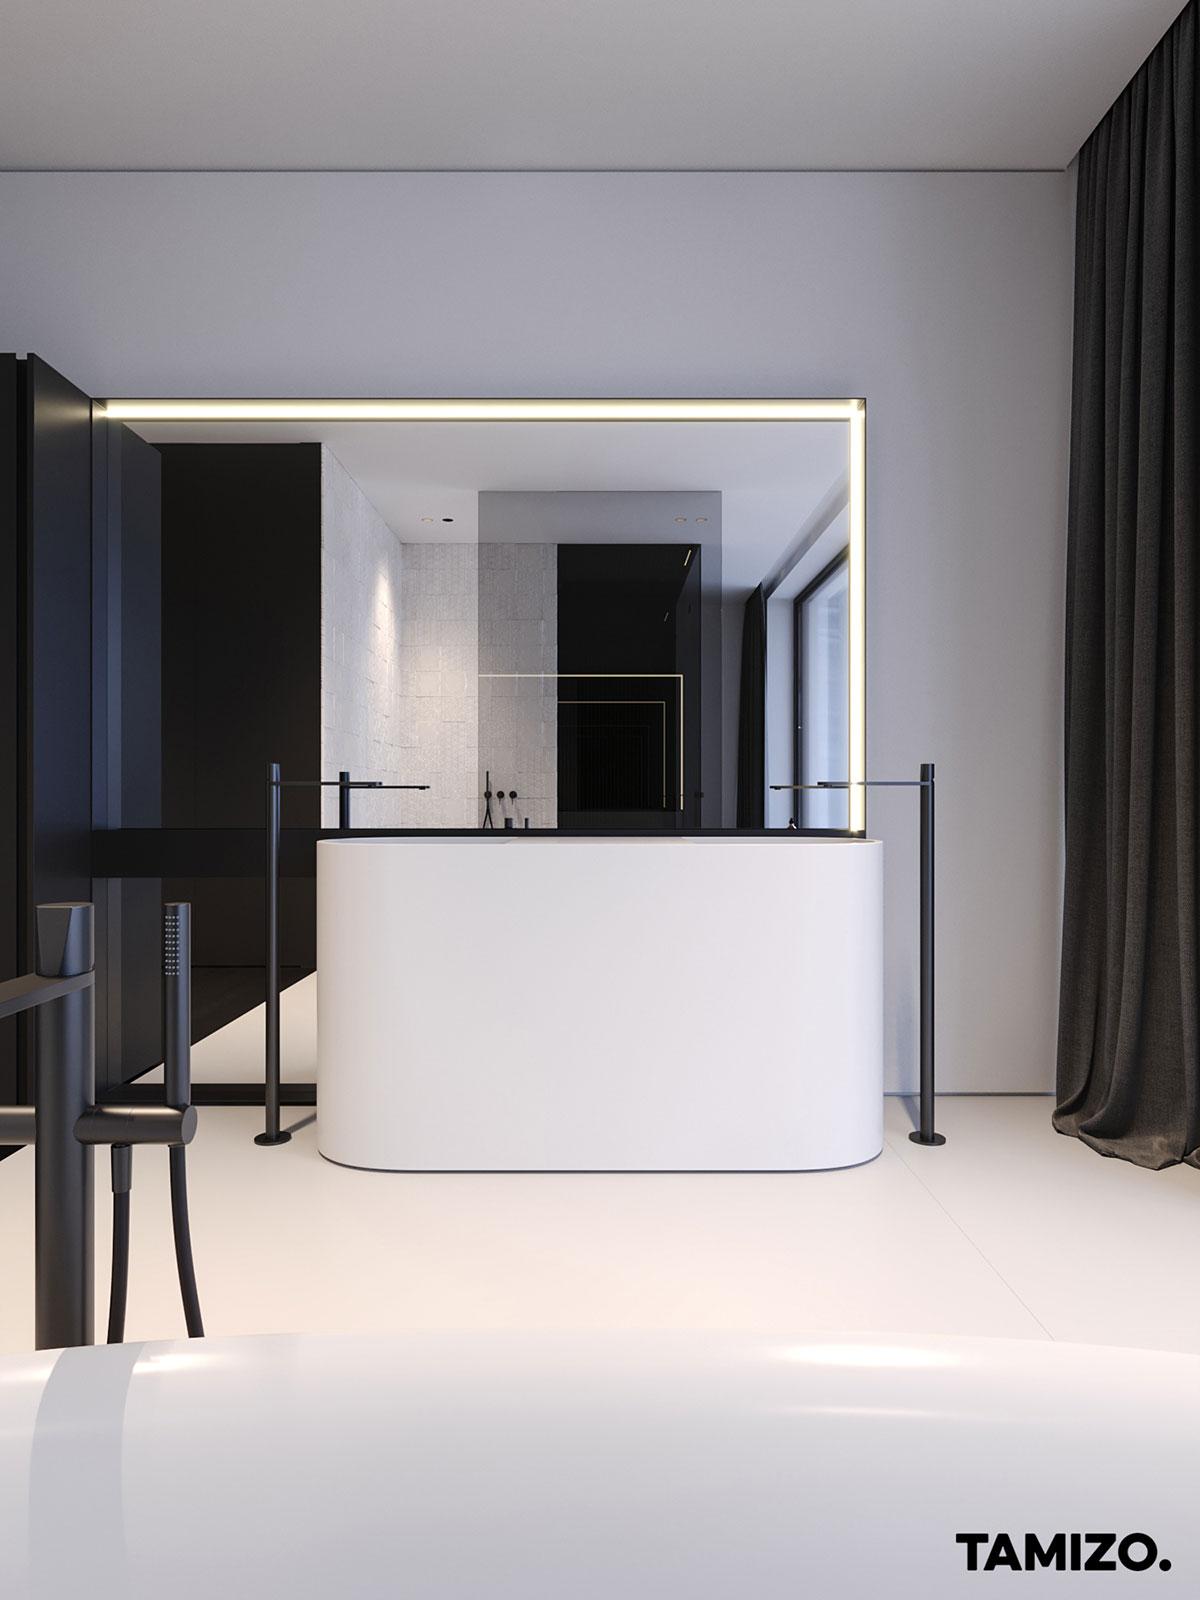 tamizo_architects_mateusz_kuo_stolarski_tomaszow_mazowiecki_interior_design_house_minimal_15